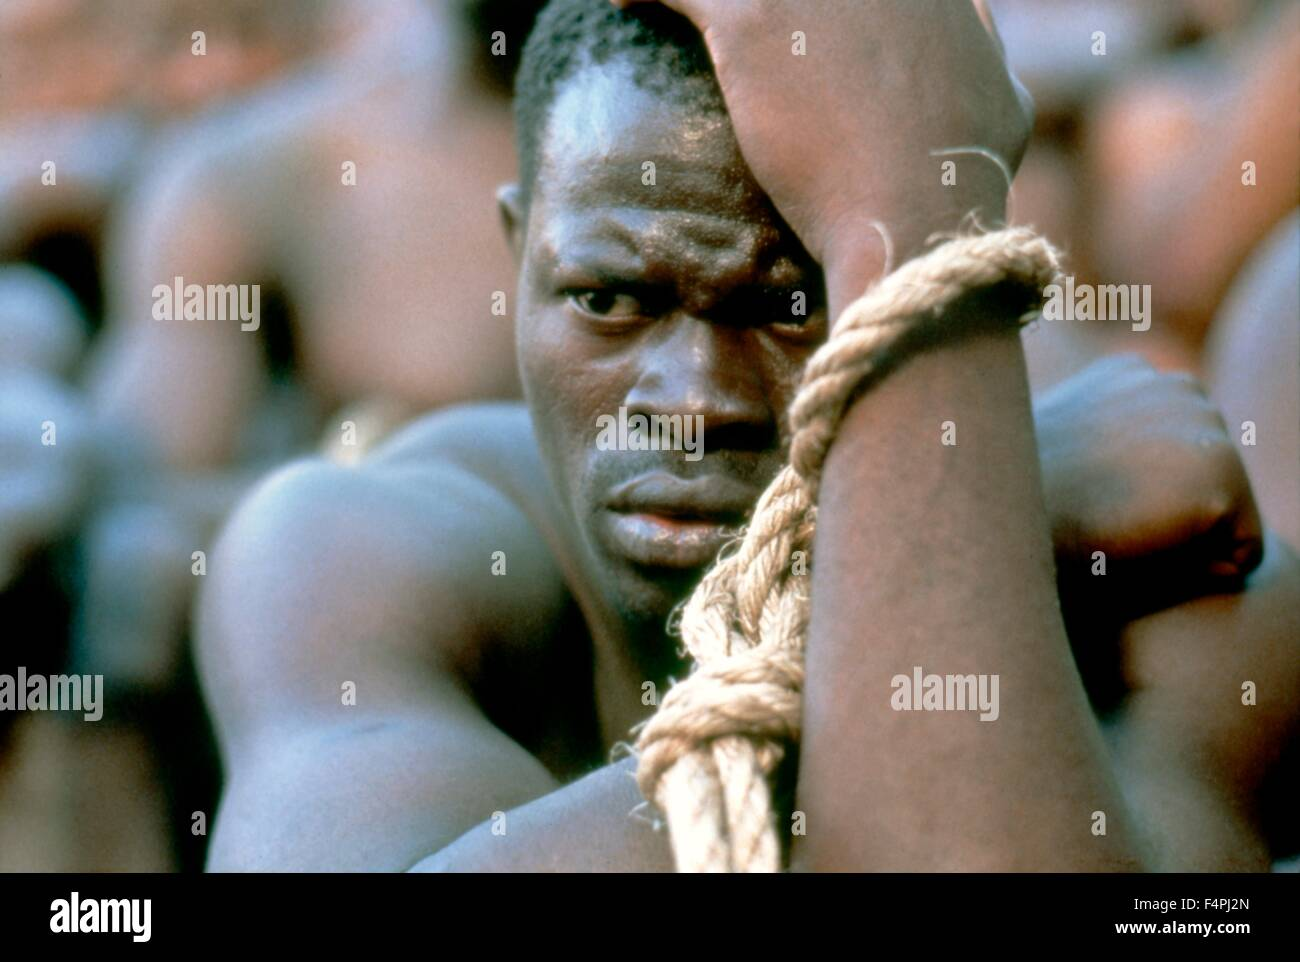 Djimon Hounsou / Amistad / 1997 dirigida por Steven Spielberg [Dreamworks Pictures] Imagen De Stock